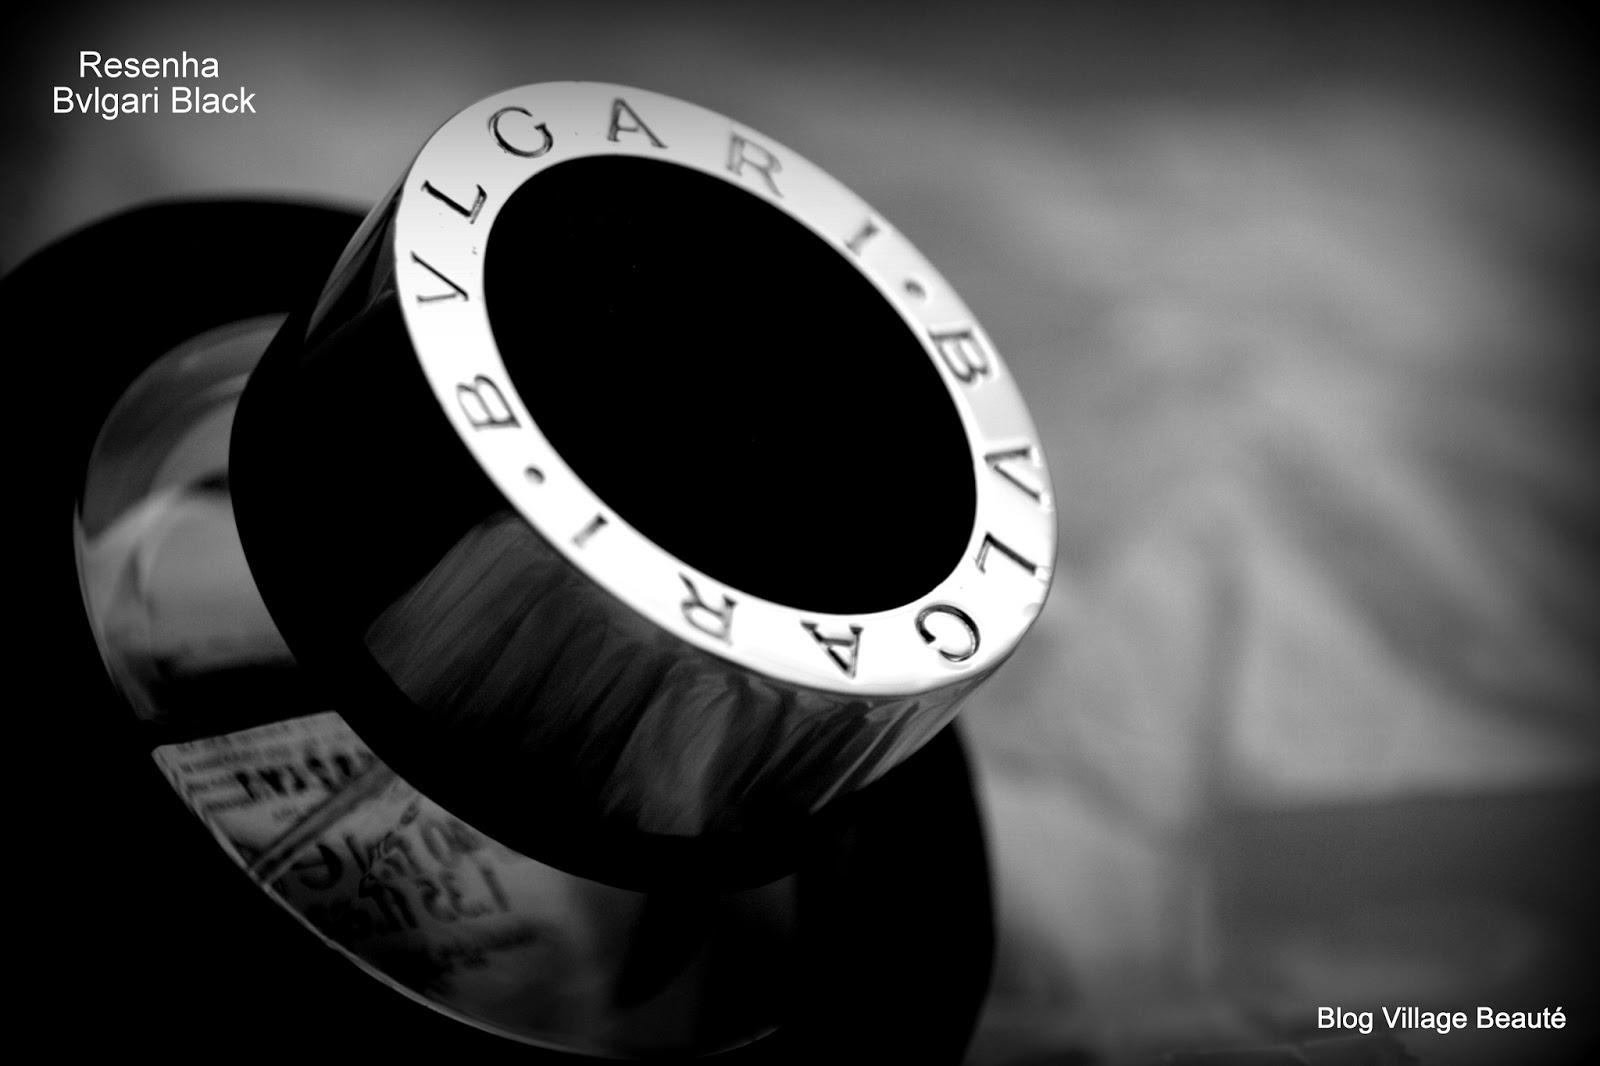 DETALHE FRASCO RESENHA DE PERFUME BVLGARI BLACK